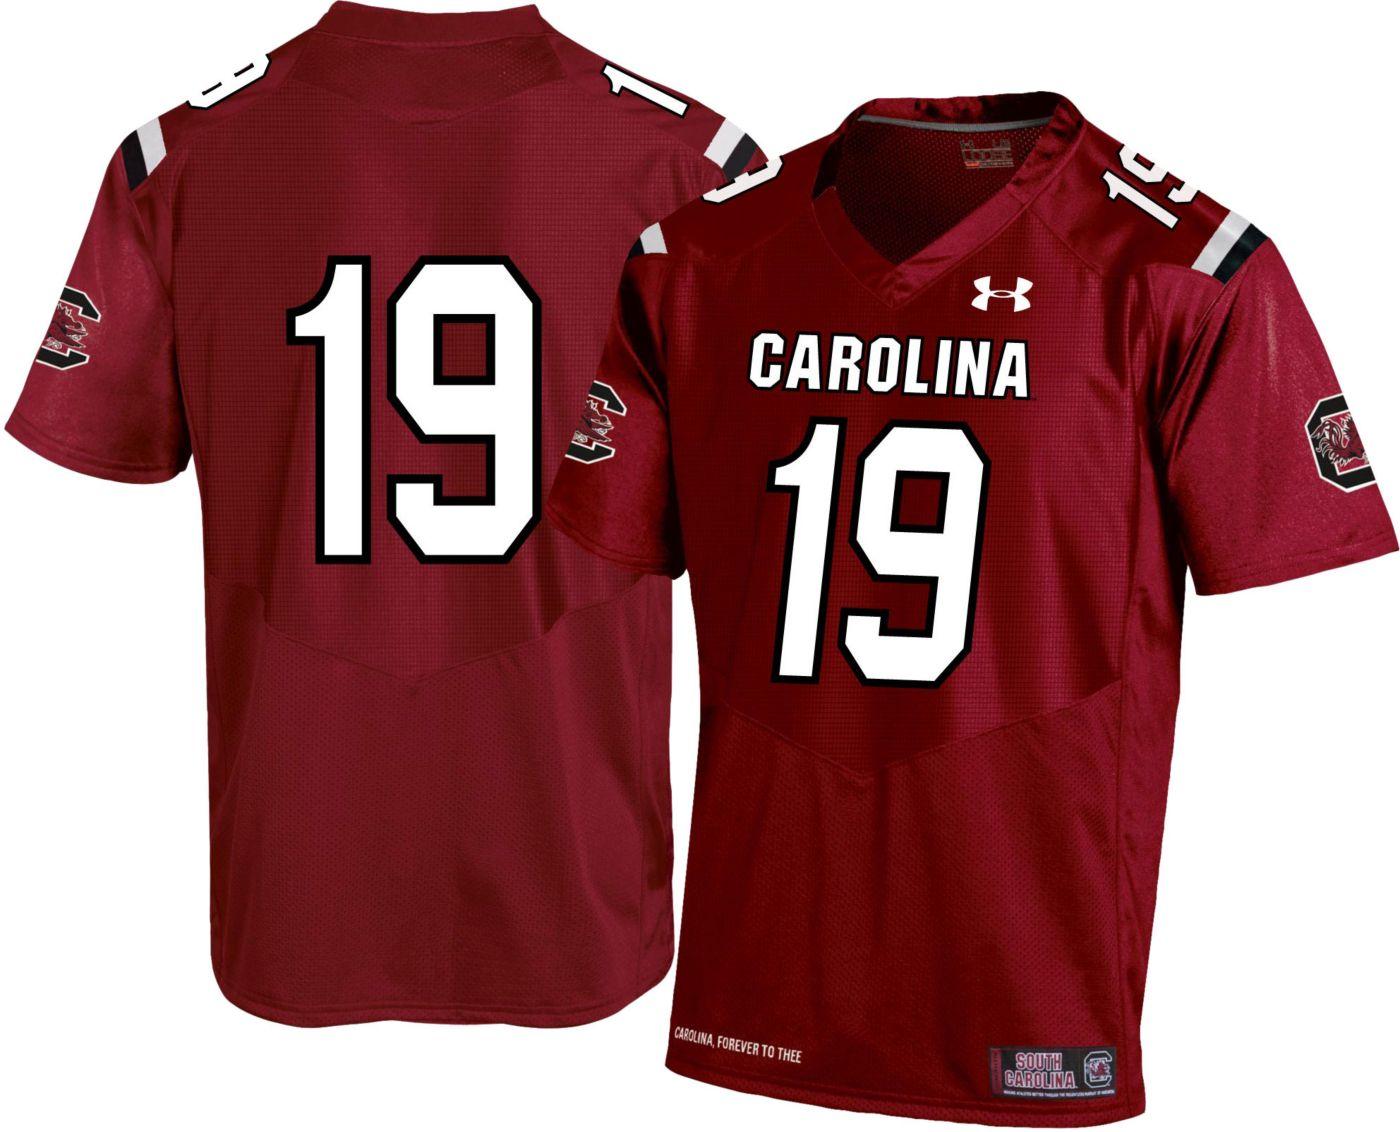 Under Armour Men's South Carolina Gamecocks #19 Garnet Replica Football Jersey